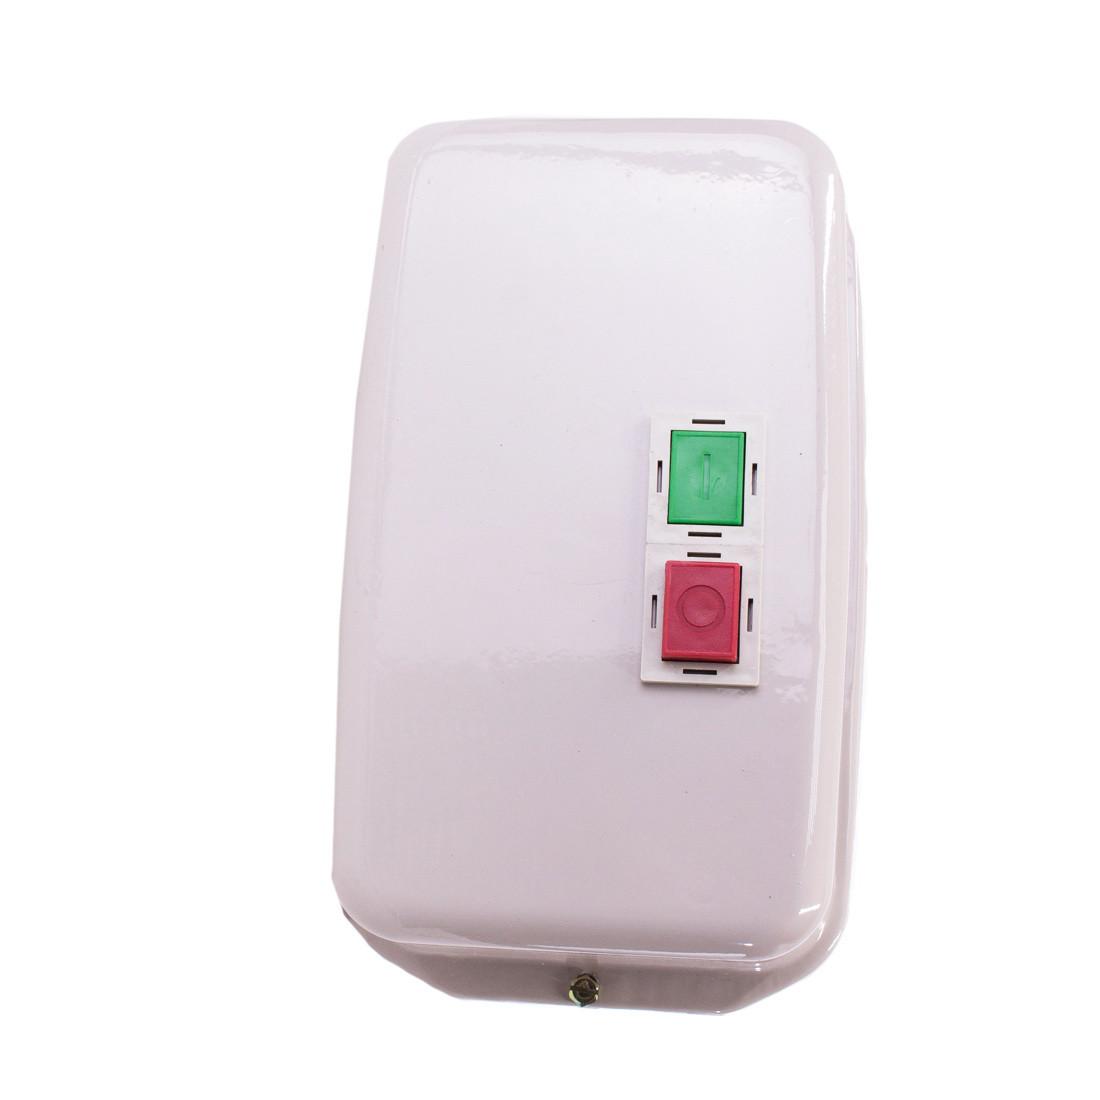 Контактор iPower КМИ-34062 40А АС 220В